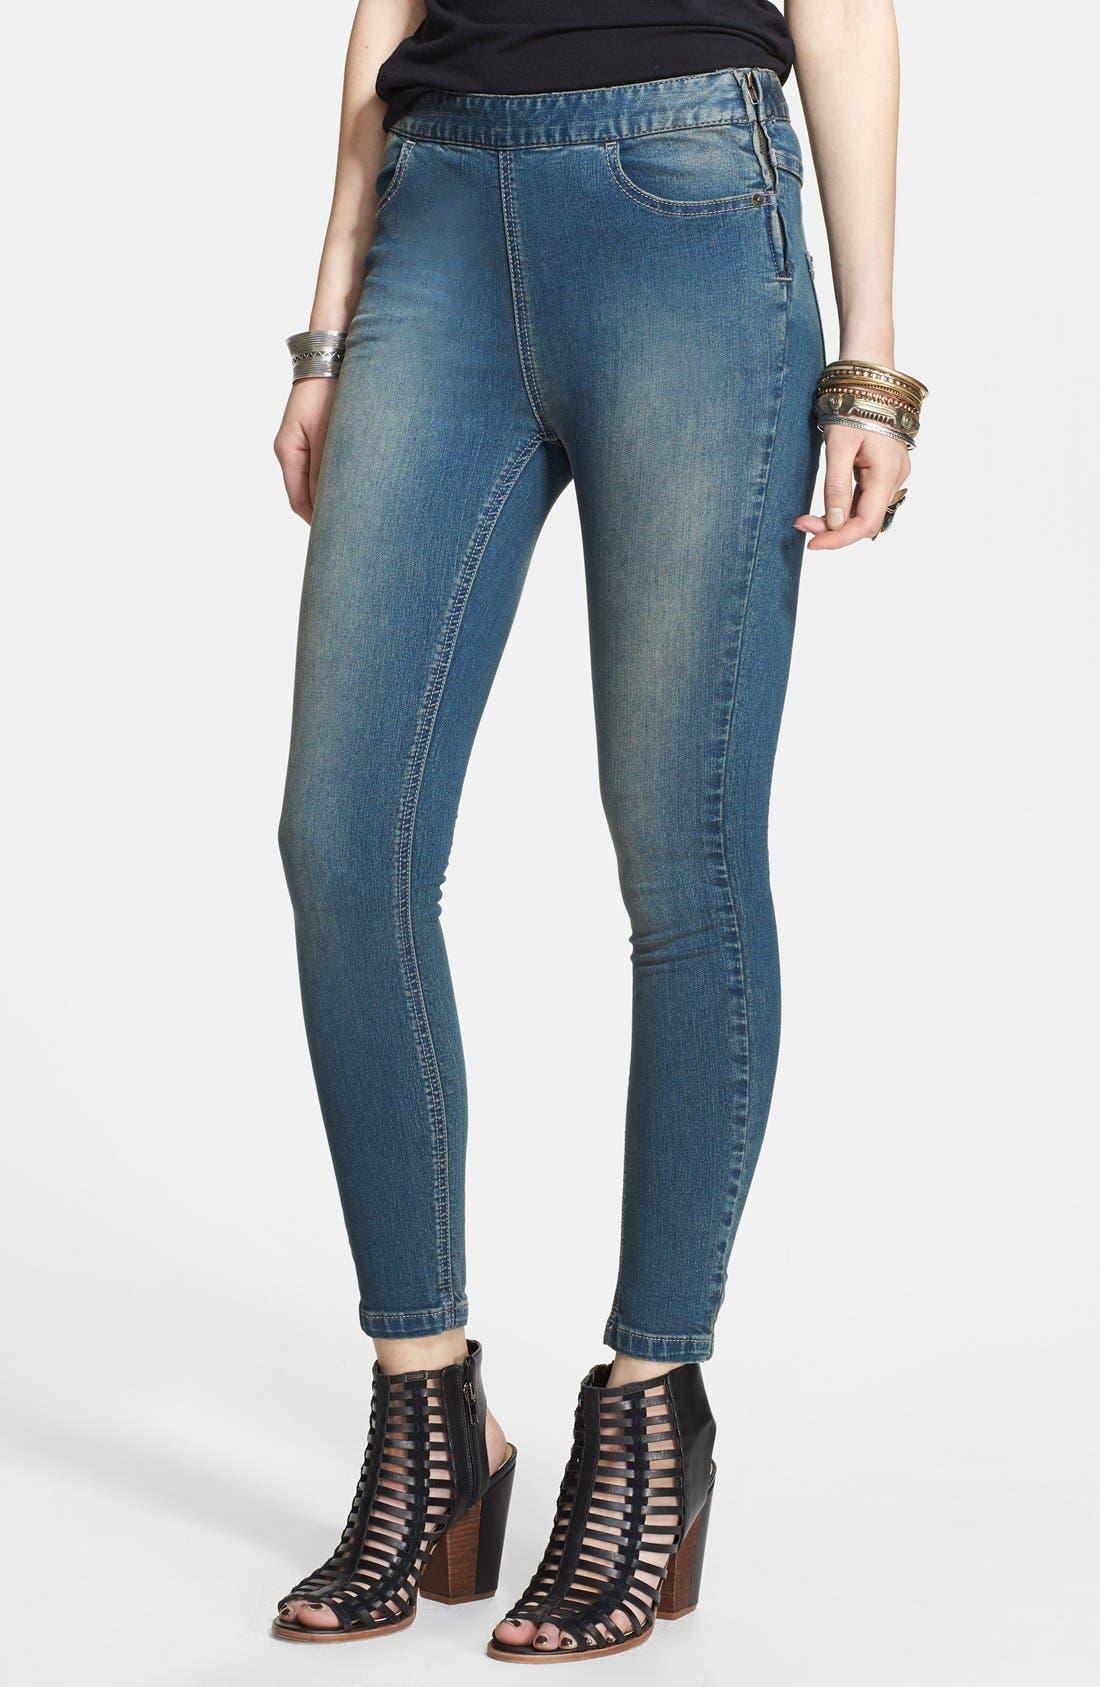 Alternate Image 1 Selected - Free People High Rise Side Zip Skinny Jeans (Coyote)